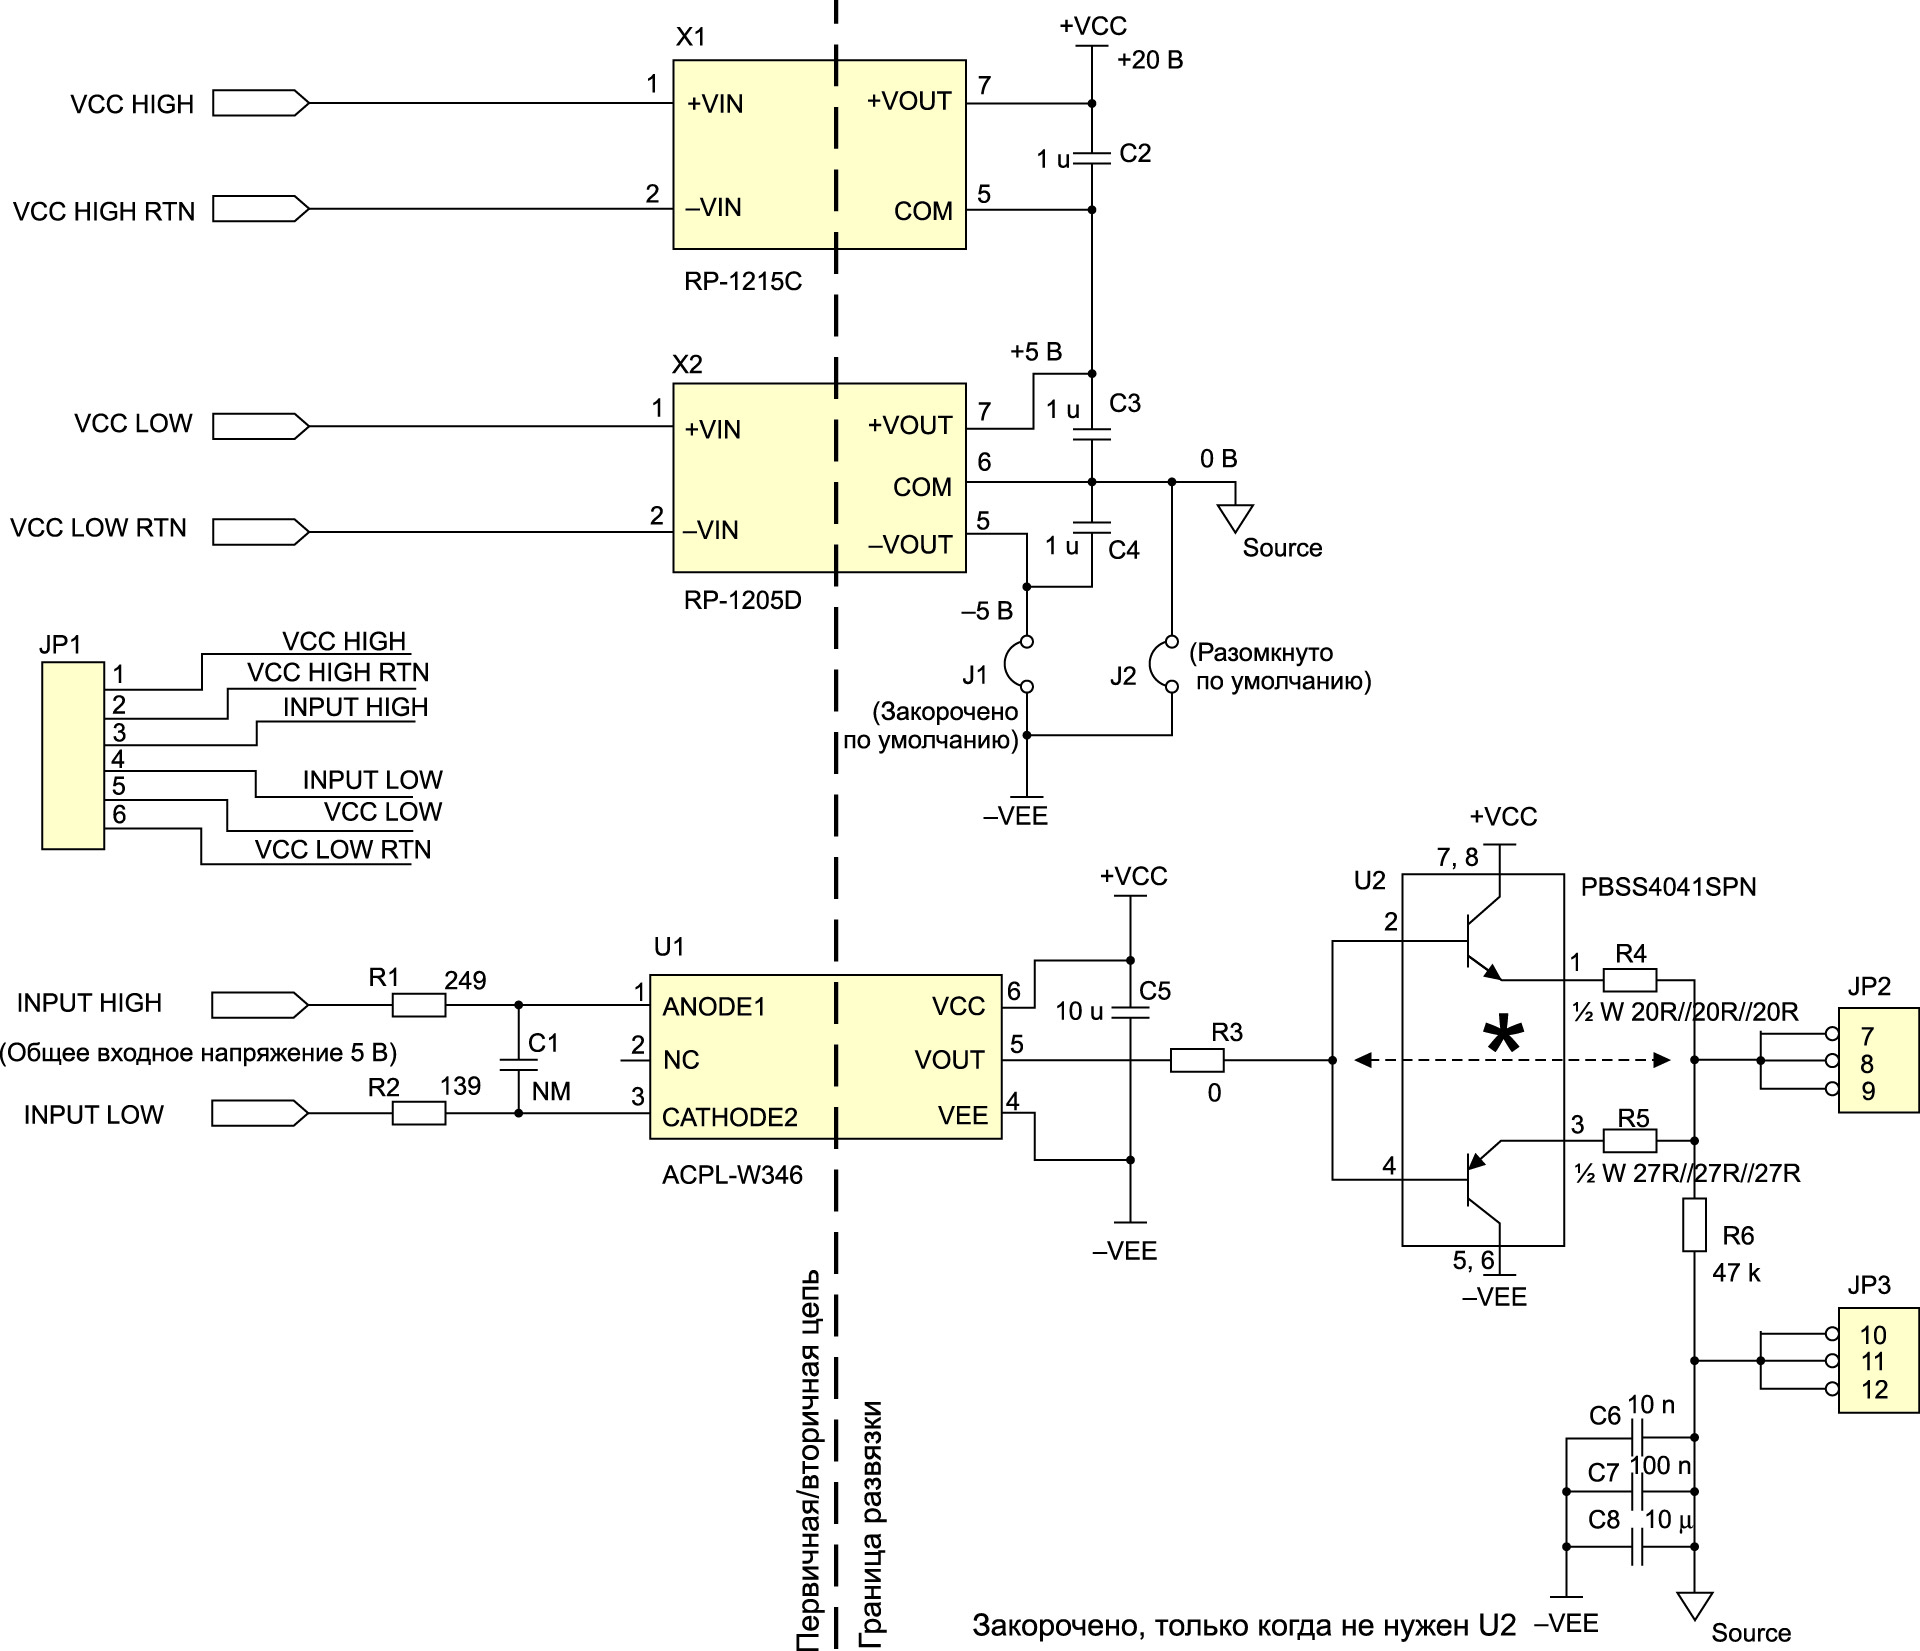 Электрическая схема исходного проекта на базе ACPL-W346 и SiC MOSFET от Cree